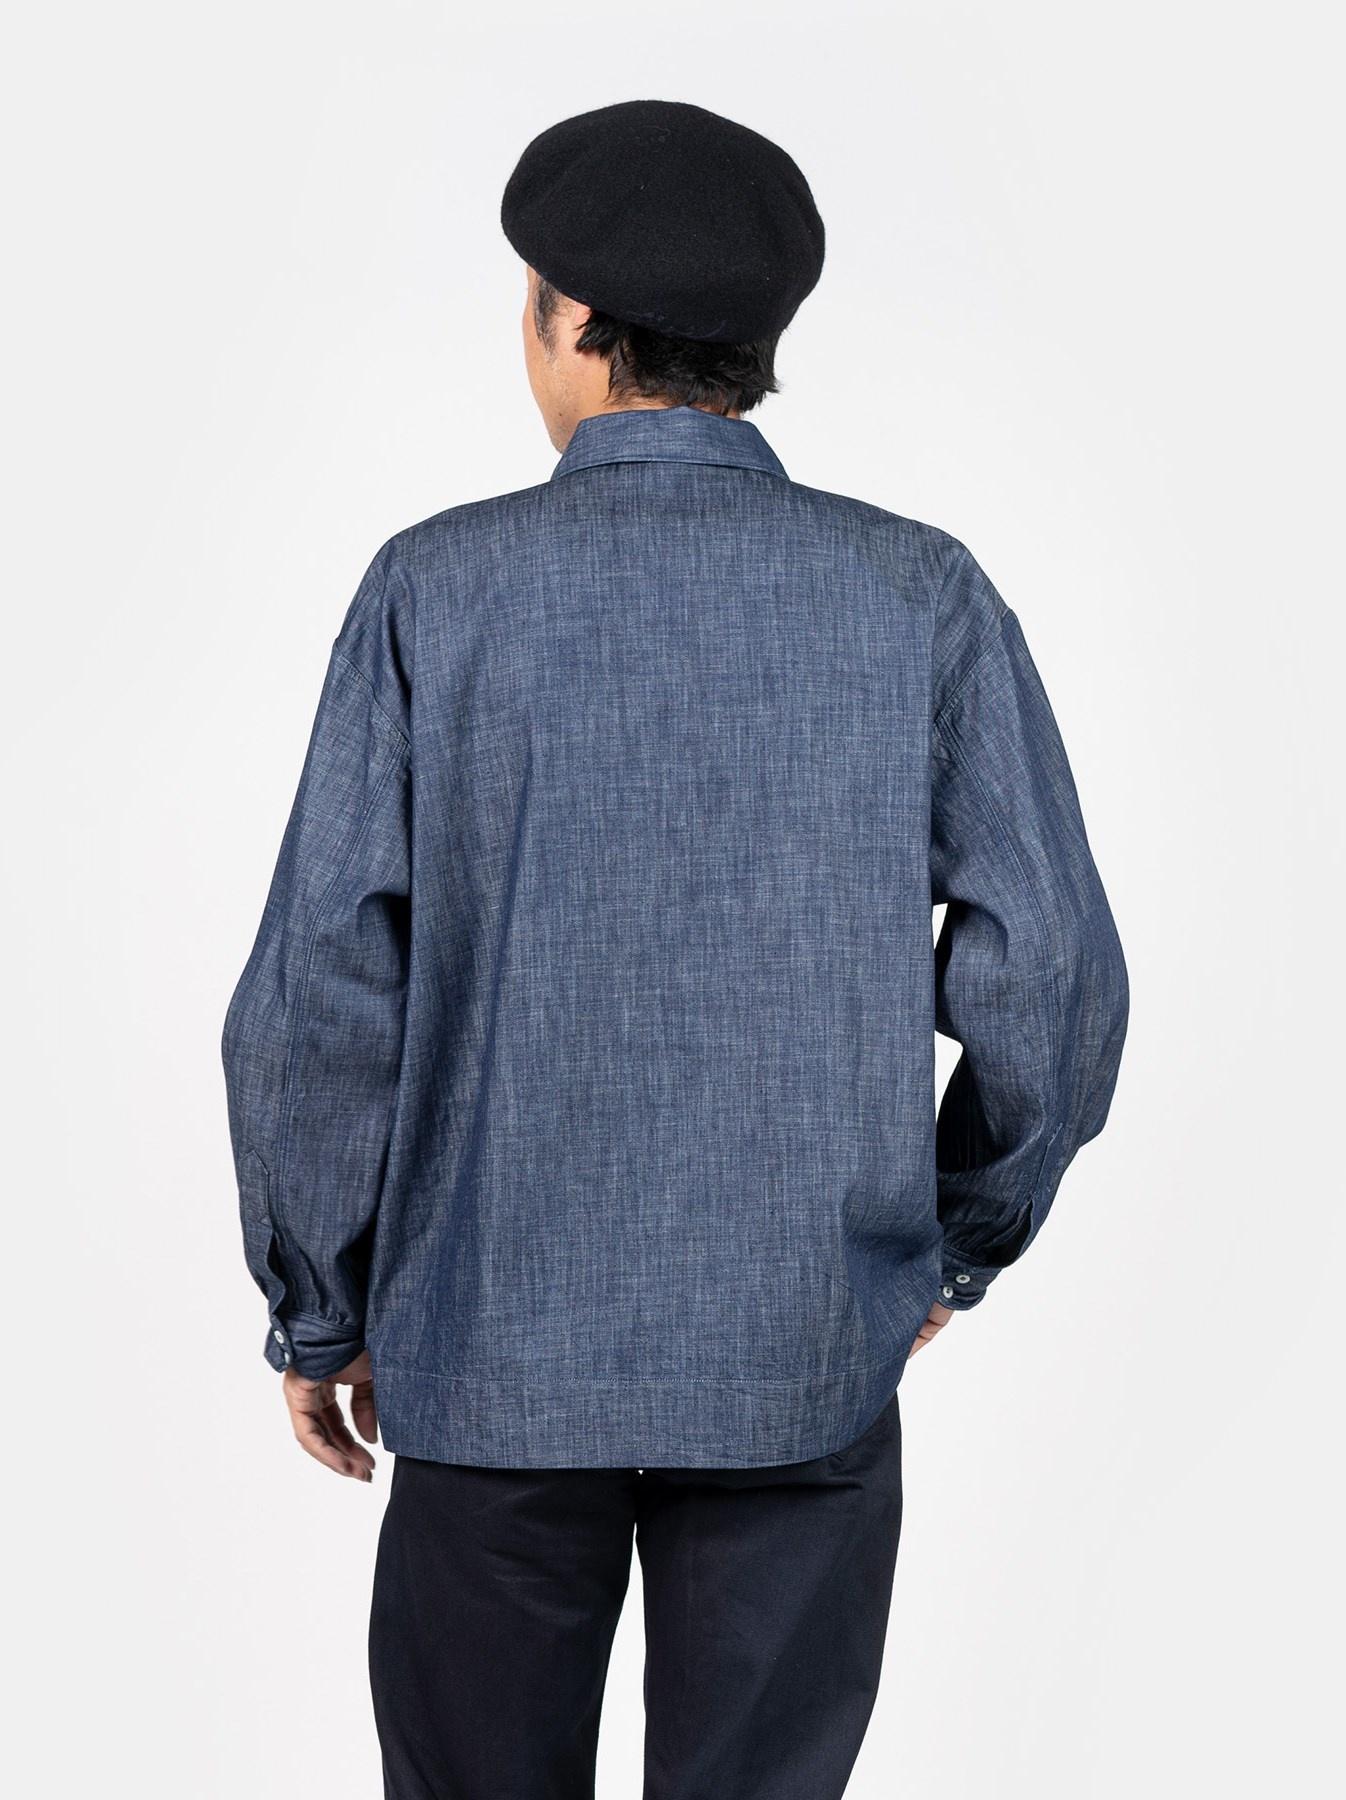 WH Goma Denim Umahiko Pullover Shirt-5